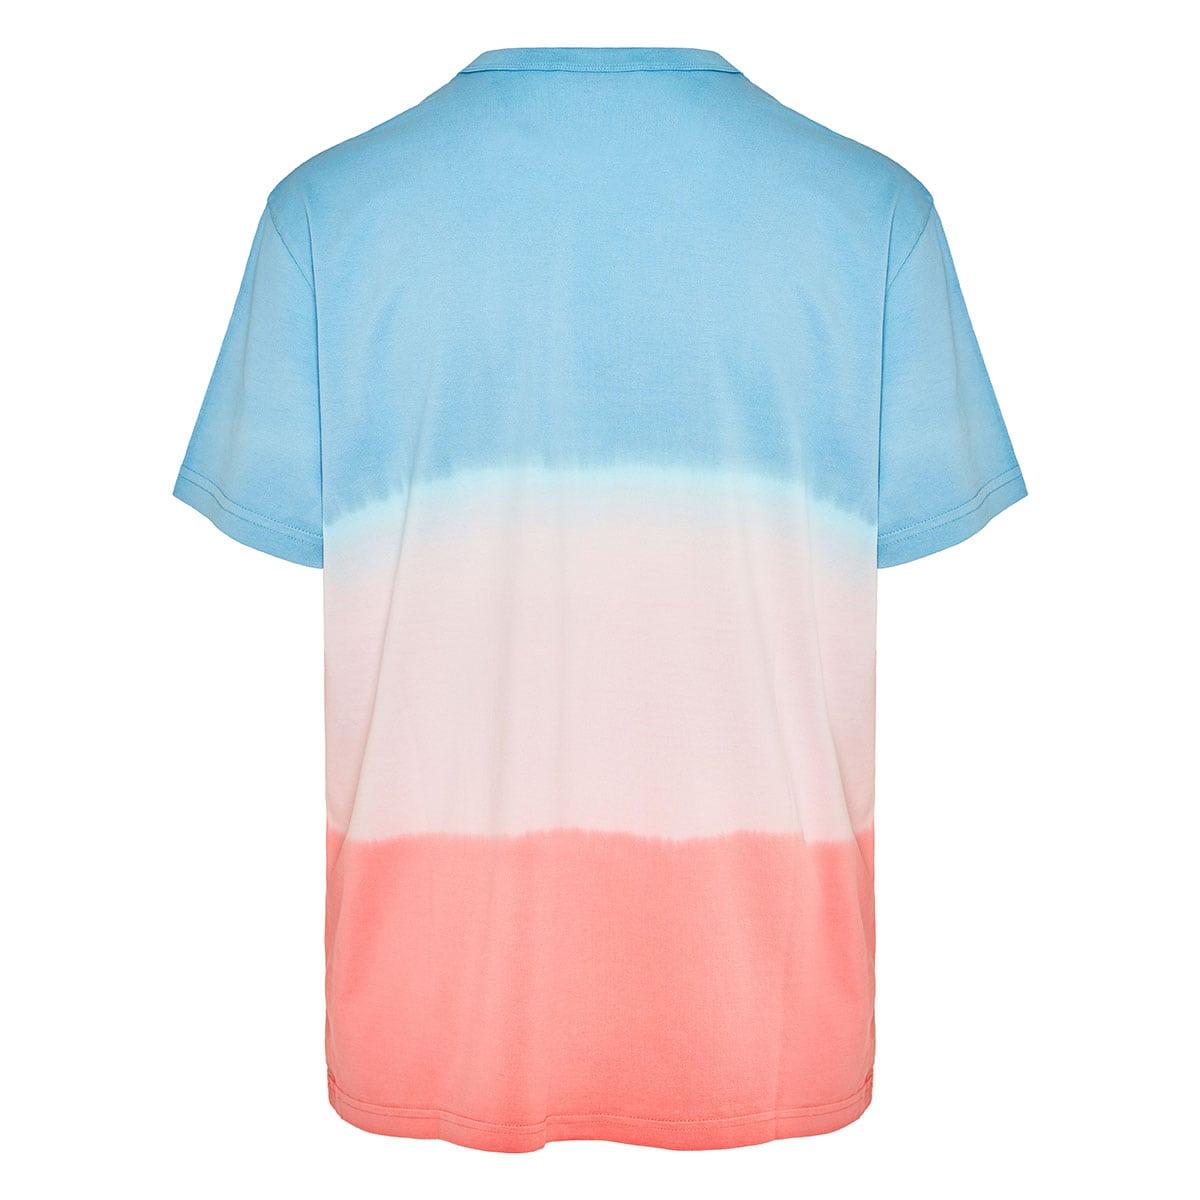 Oversized tie-dyo logo t-shirt